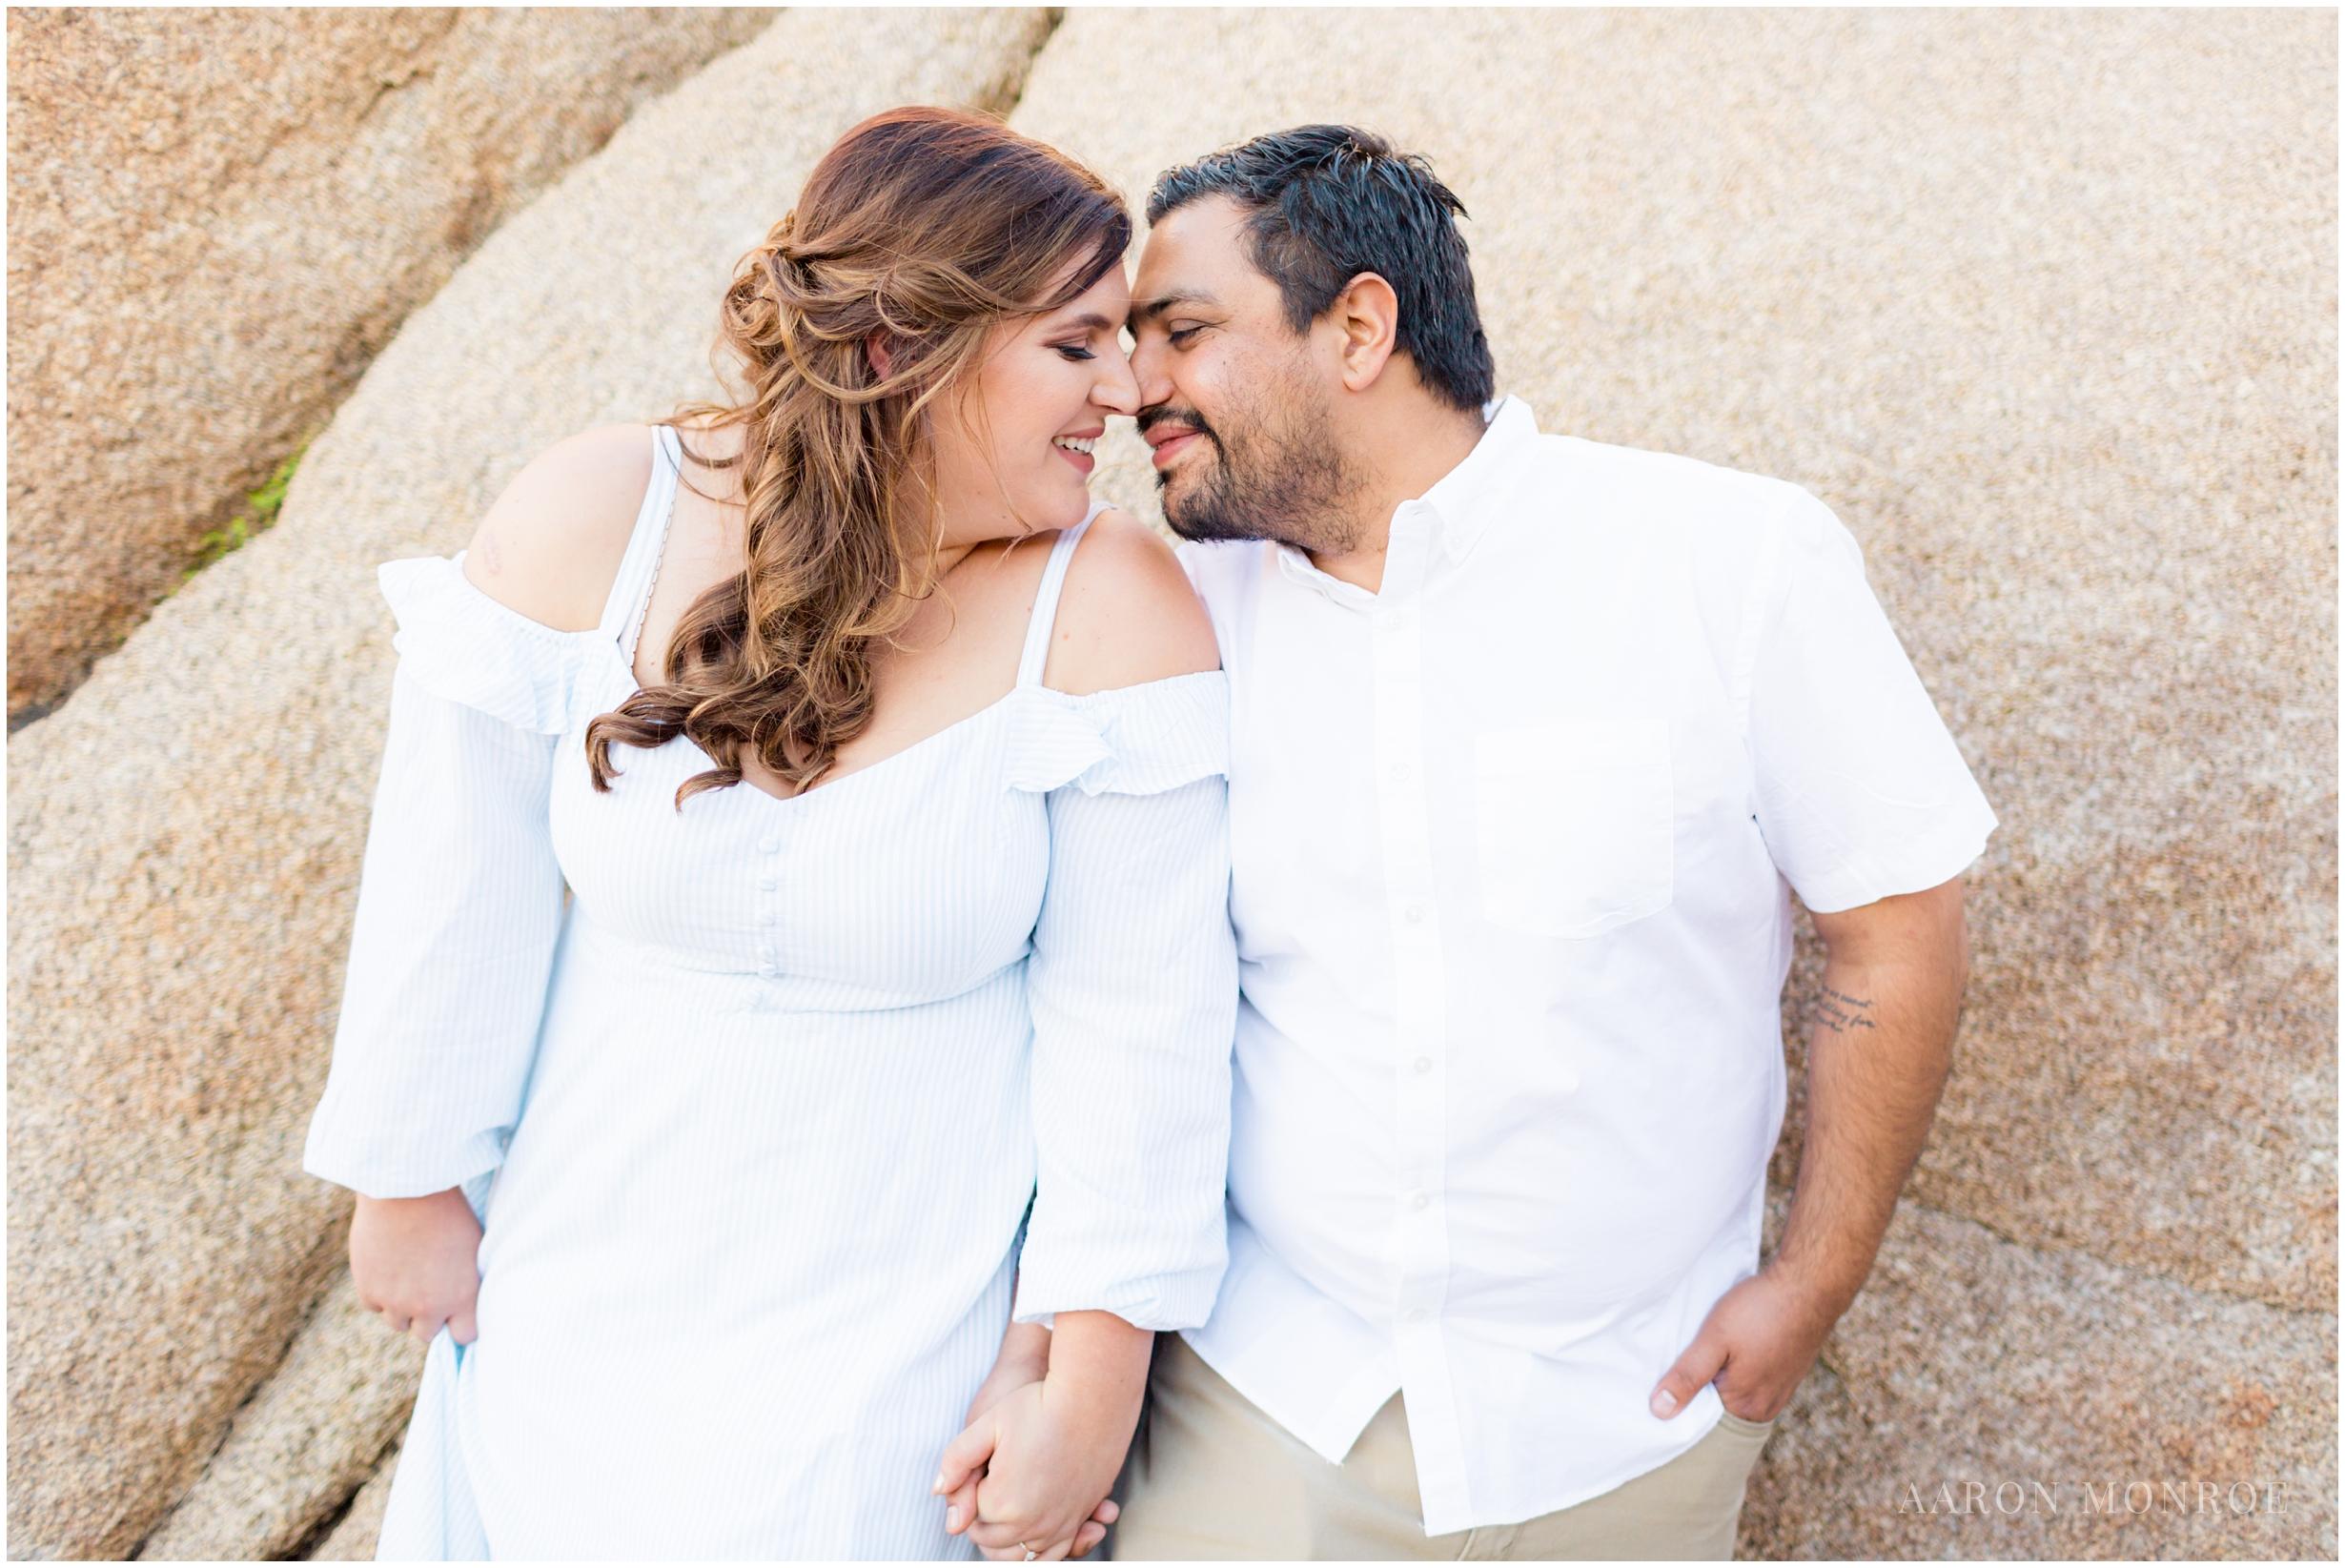 Joshua_Tree_Engagement_Los_Angeles_Wedding_Photographer_0214.jpg